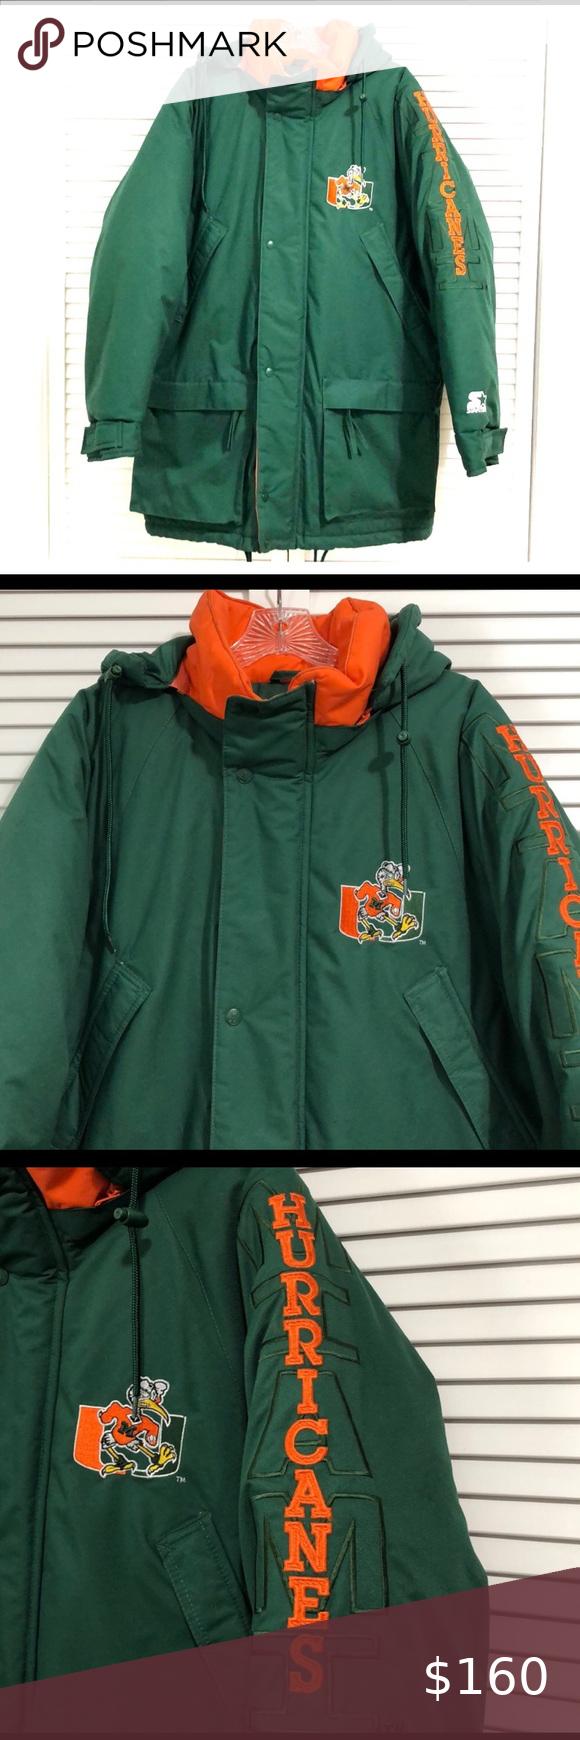 Vintage Starter Miami Hurricanes Trenchcoat Jacket In 2020 Trench Coat Jackets Miami Hurricanes